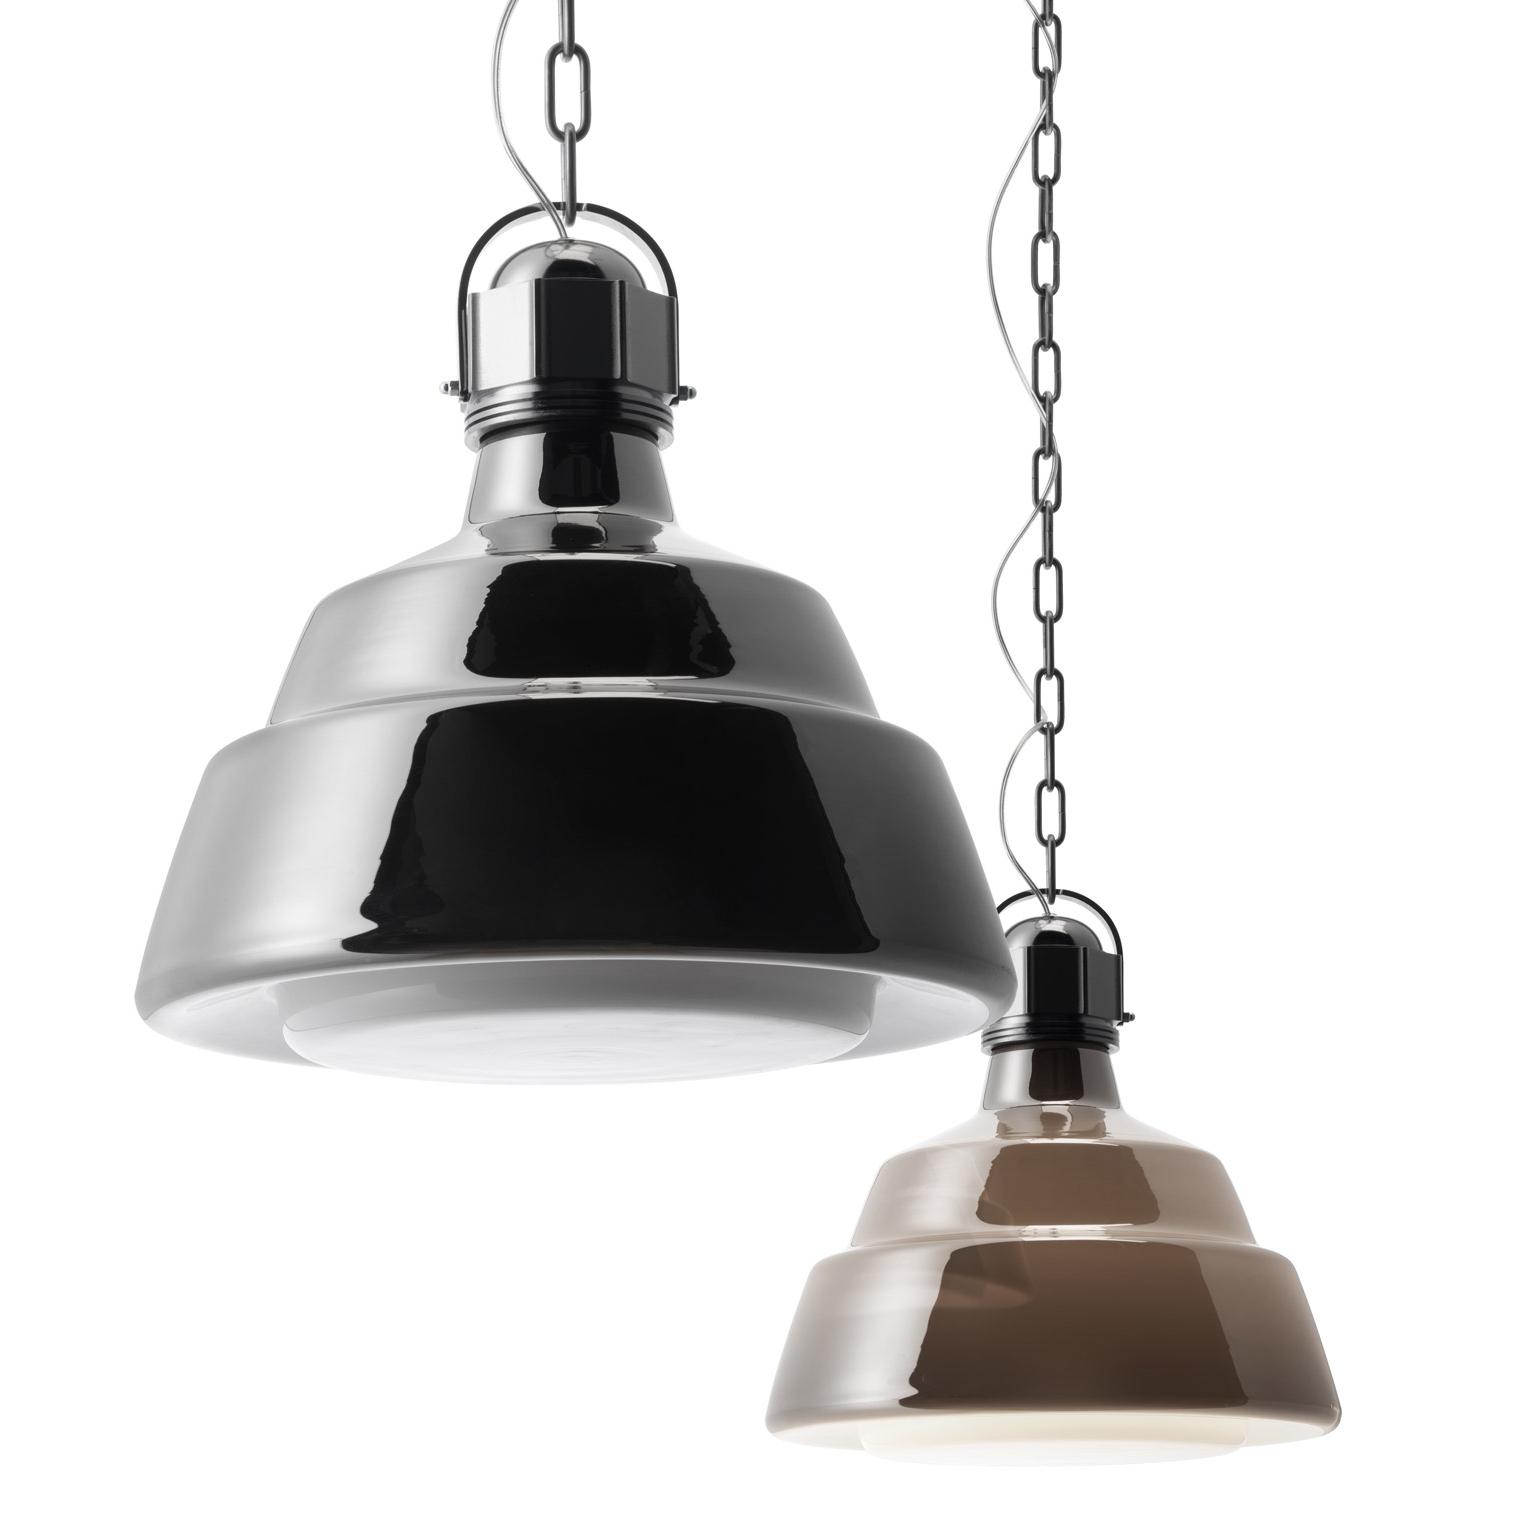 glas-suspension-lamp-big-4.jpg